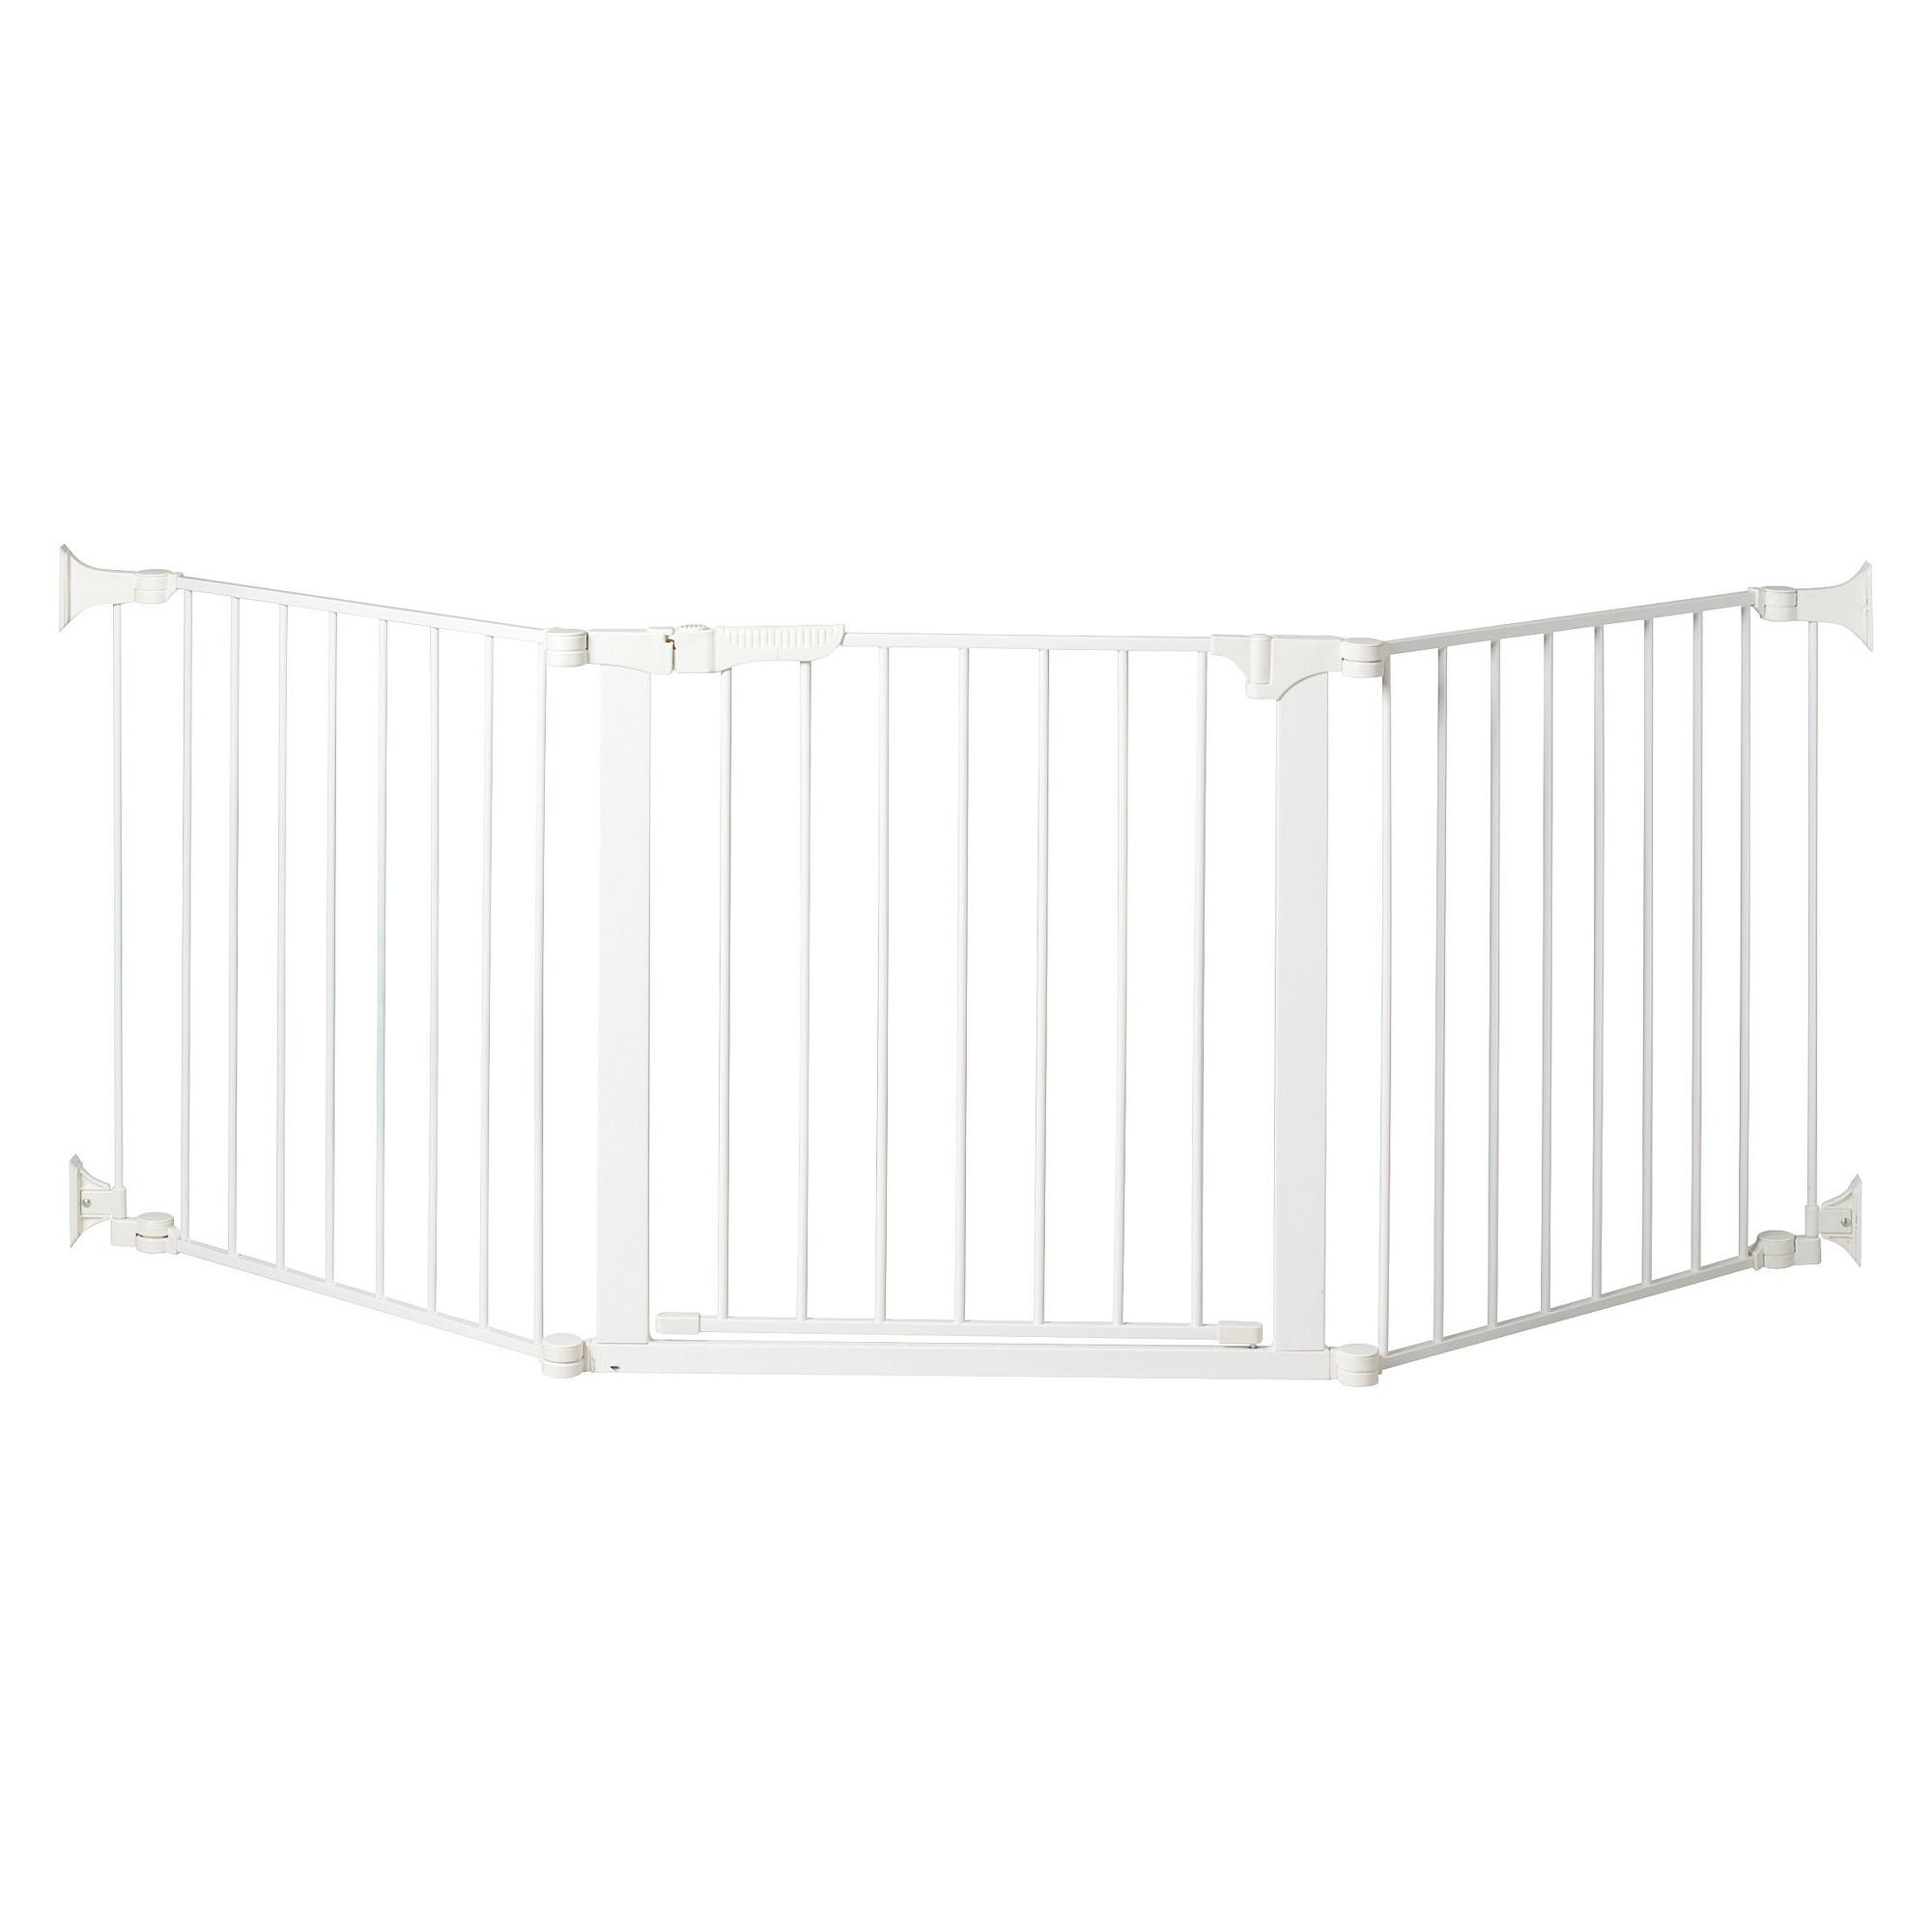 KidCo Auto Close Configure Baby Gate Baby gates, Extra